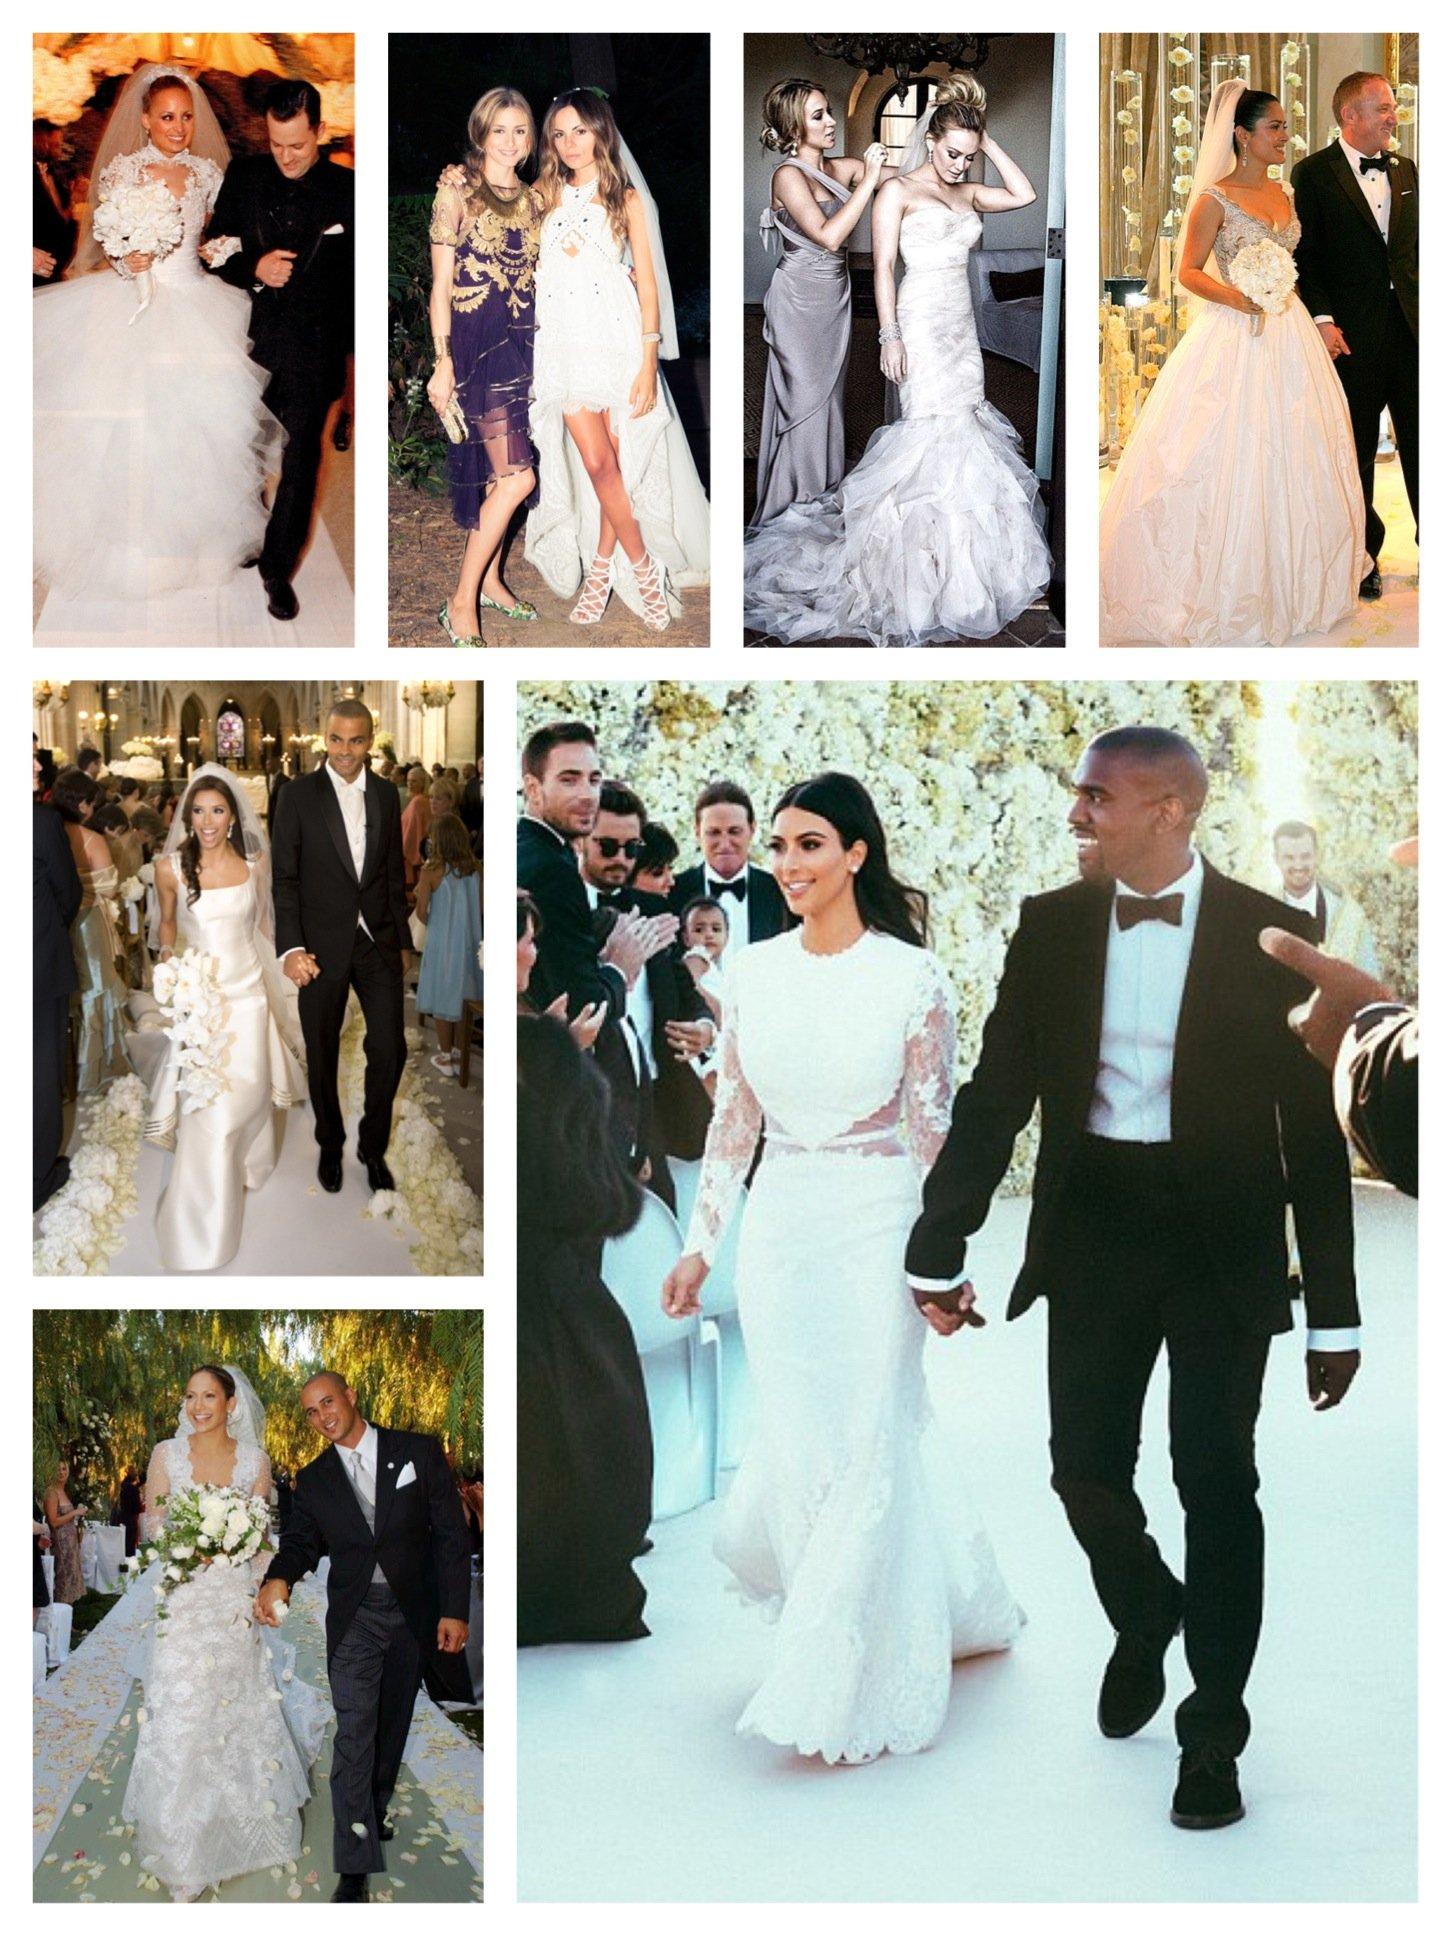 petite wedding dresses uk us wedding dresses for petite Petite celebrity wedding dresses